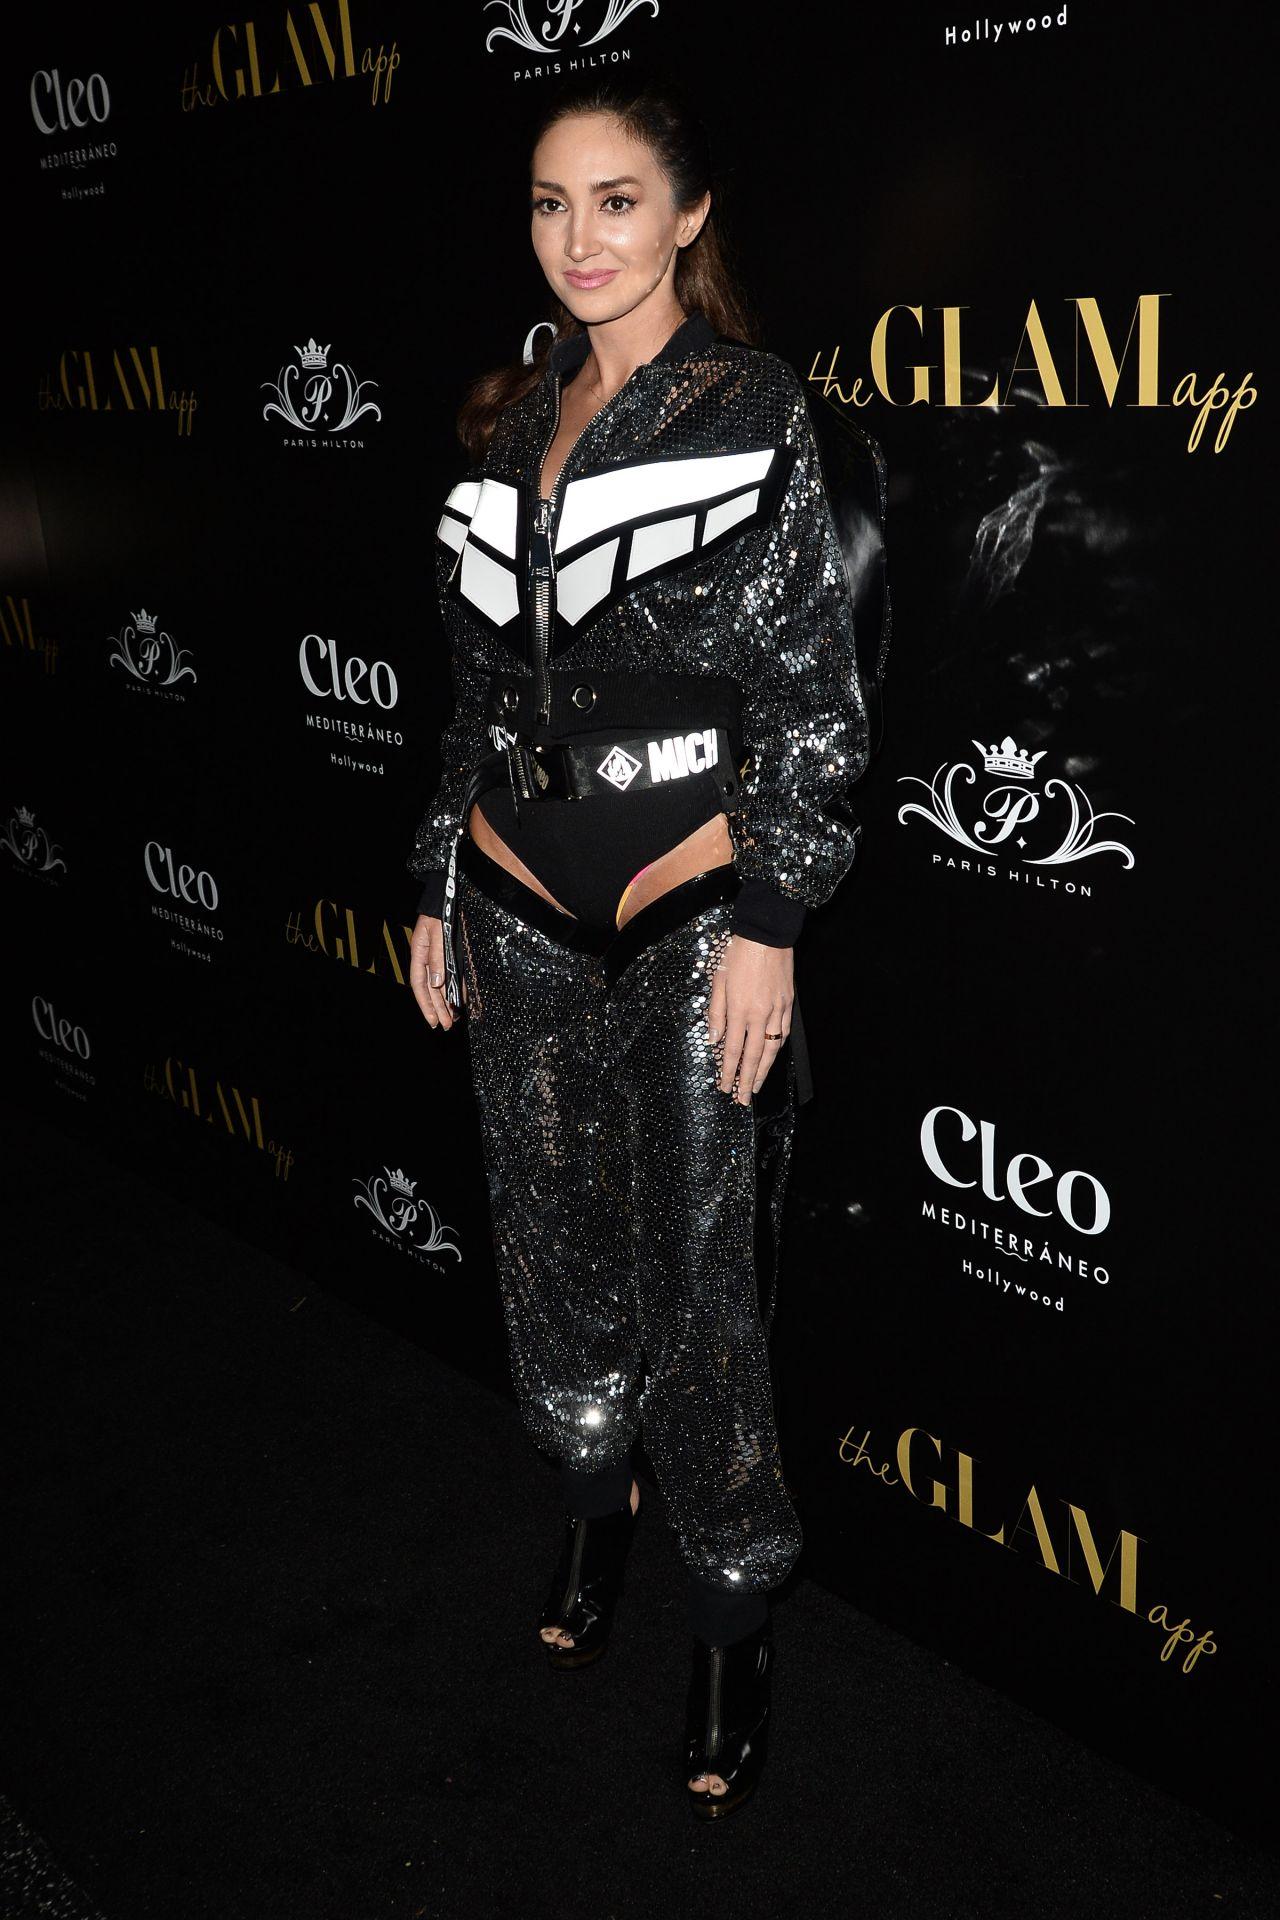 Megan Pormer The Glam App Launch In La 06 19 2019